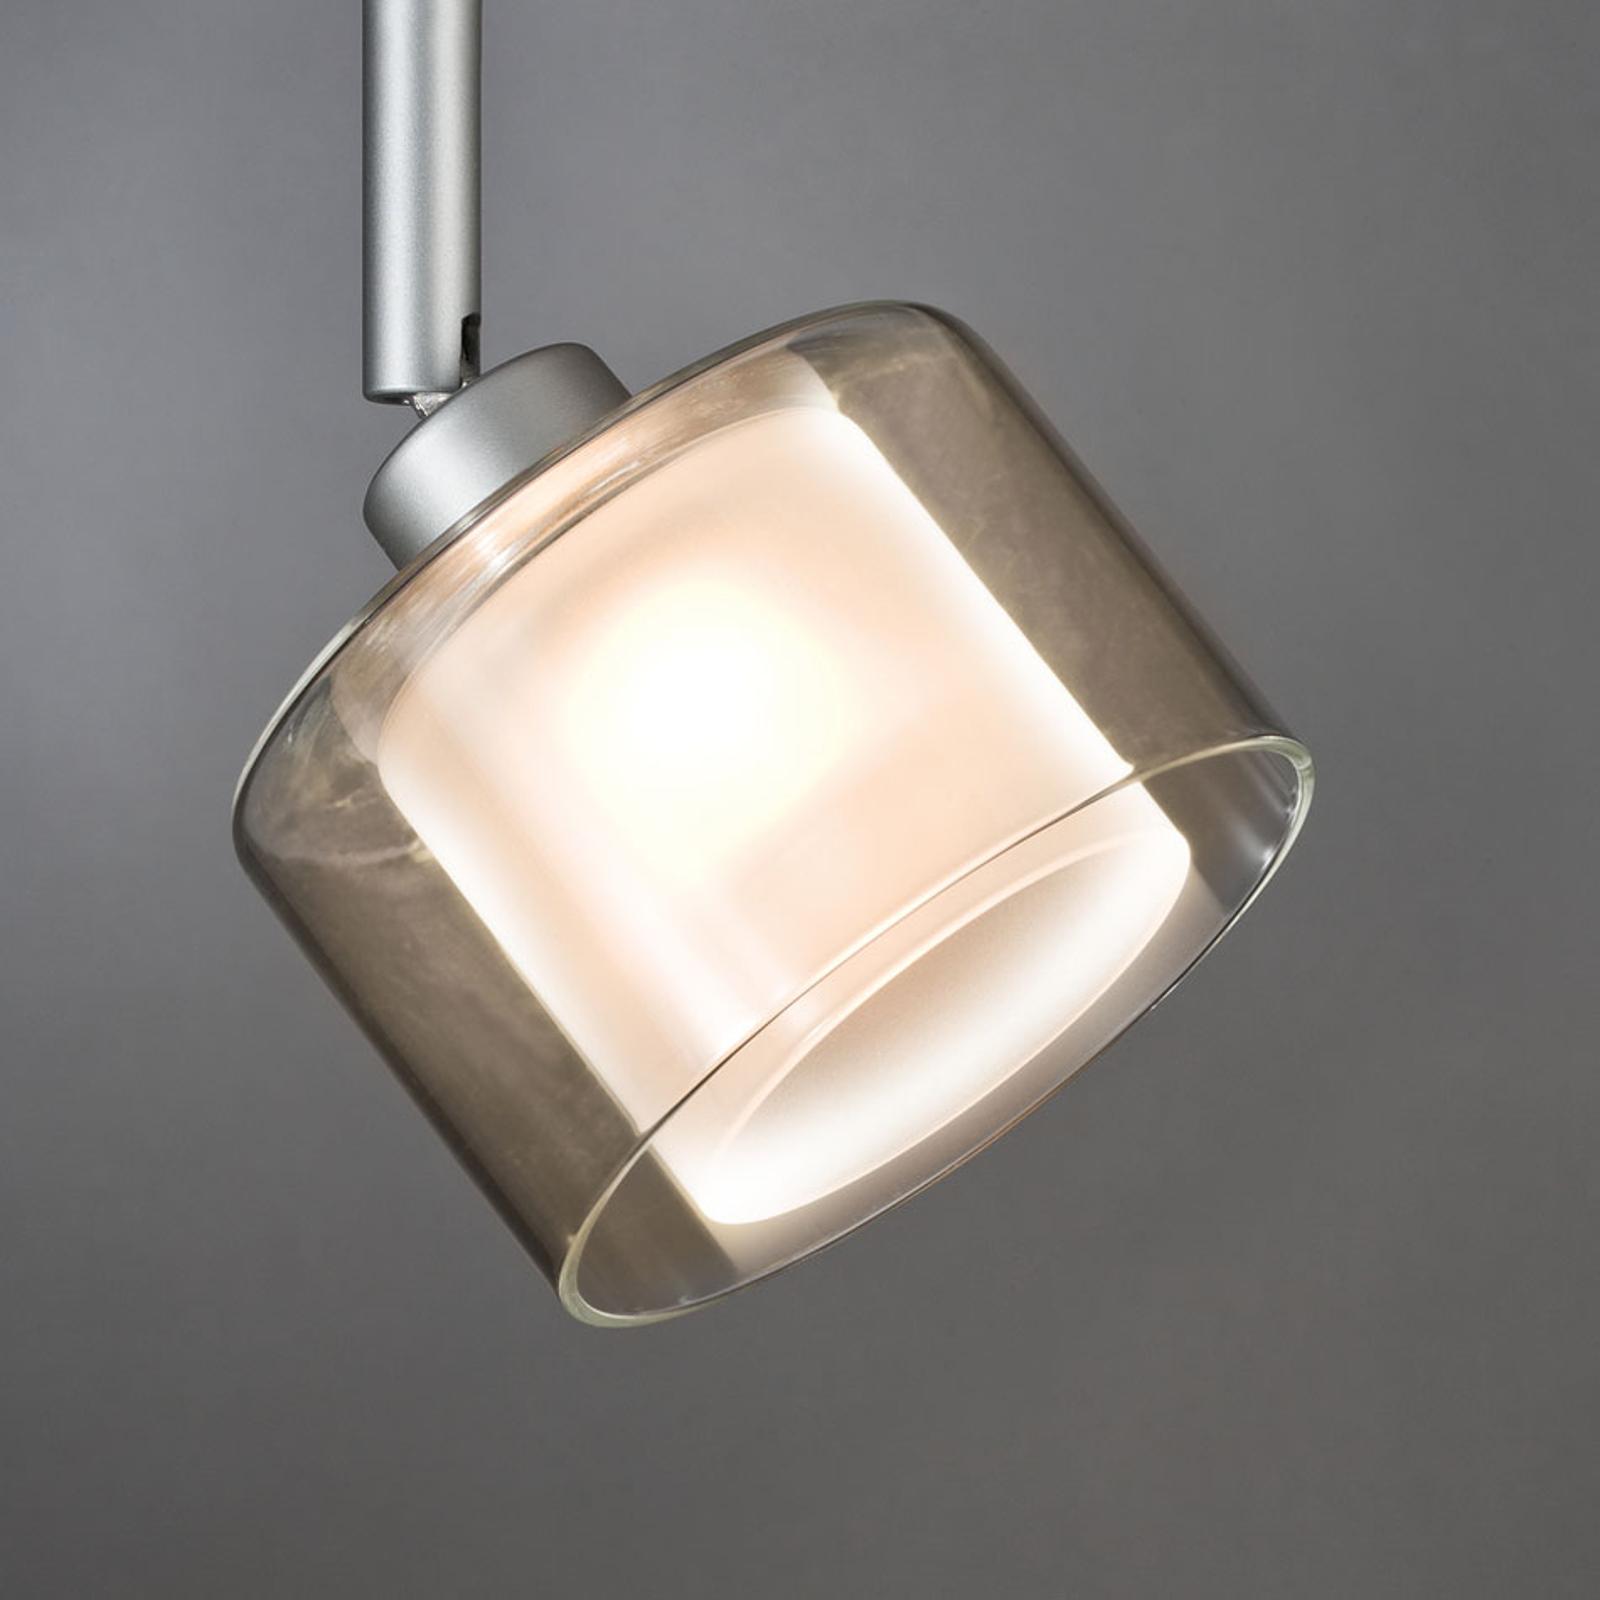 Paulmann URail DecoSystems Glasschirm Twice, klar